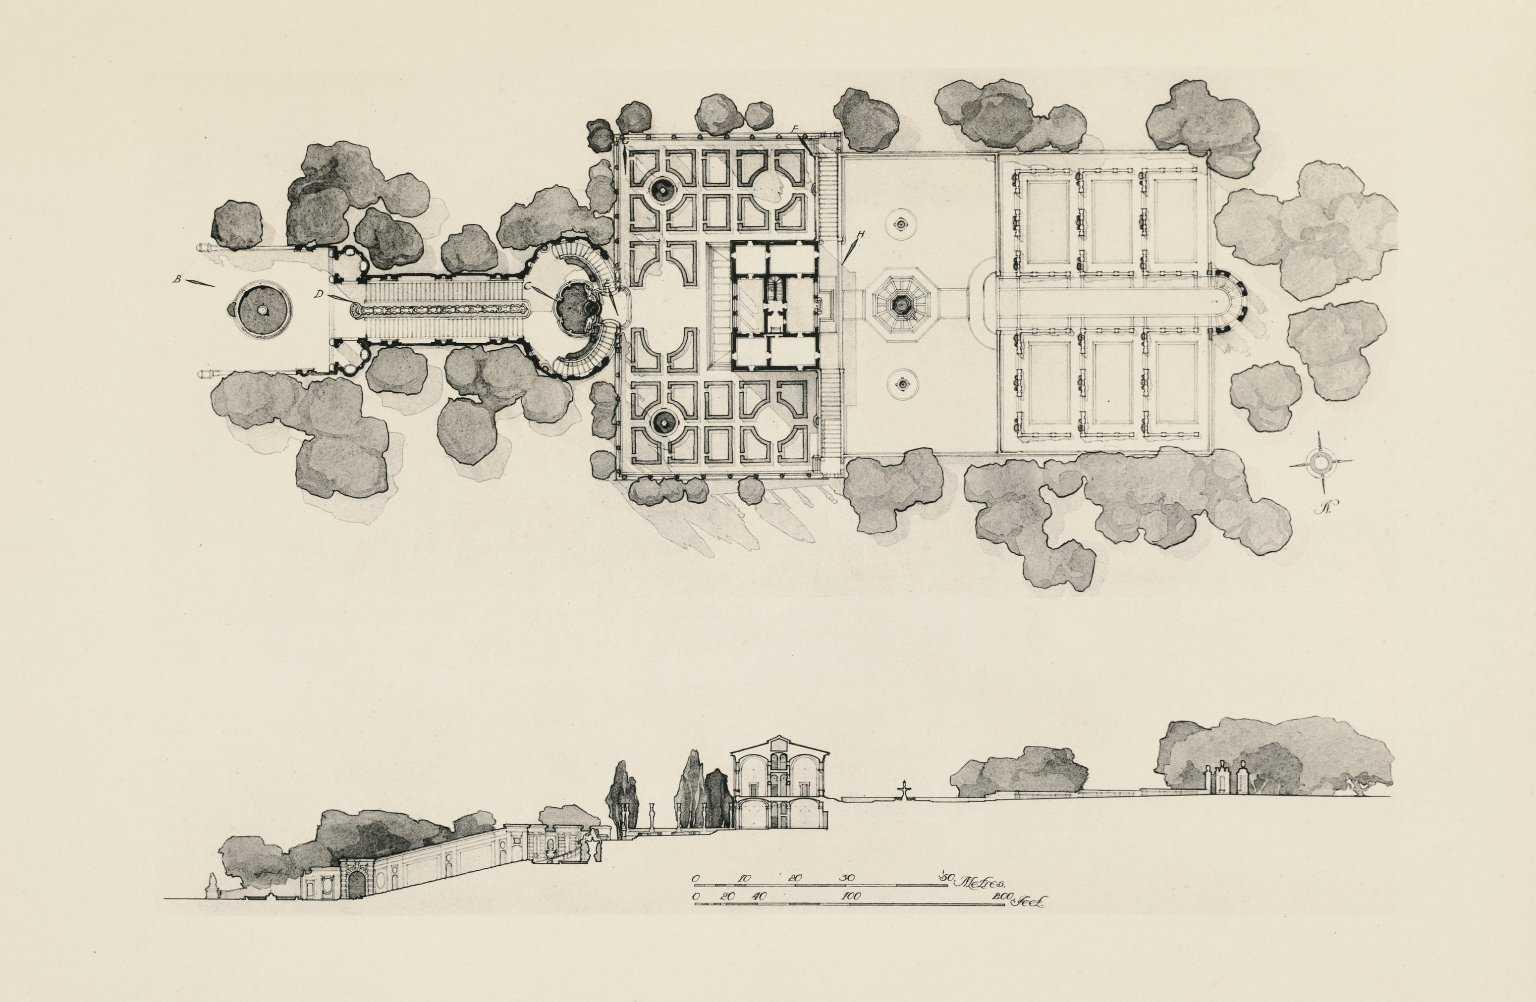 sketchup教程下载_意大利法尔奈斯庄园图纸模型及资料图片全套资料免费下载 ...